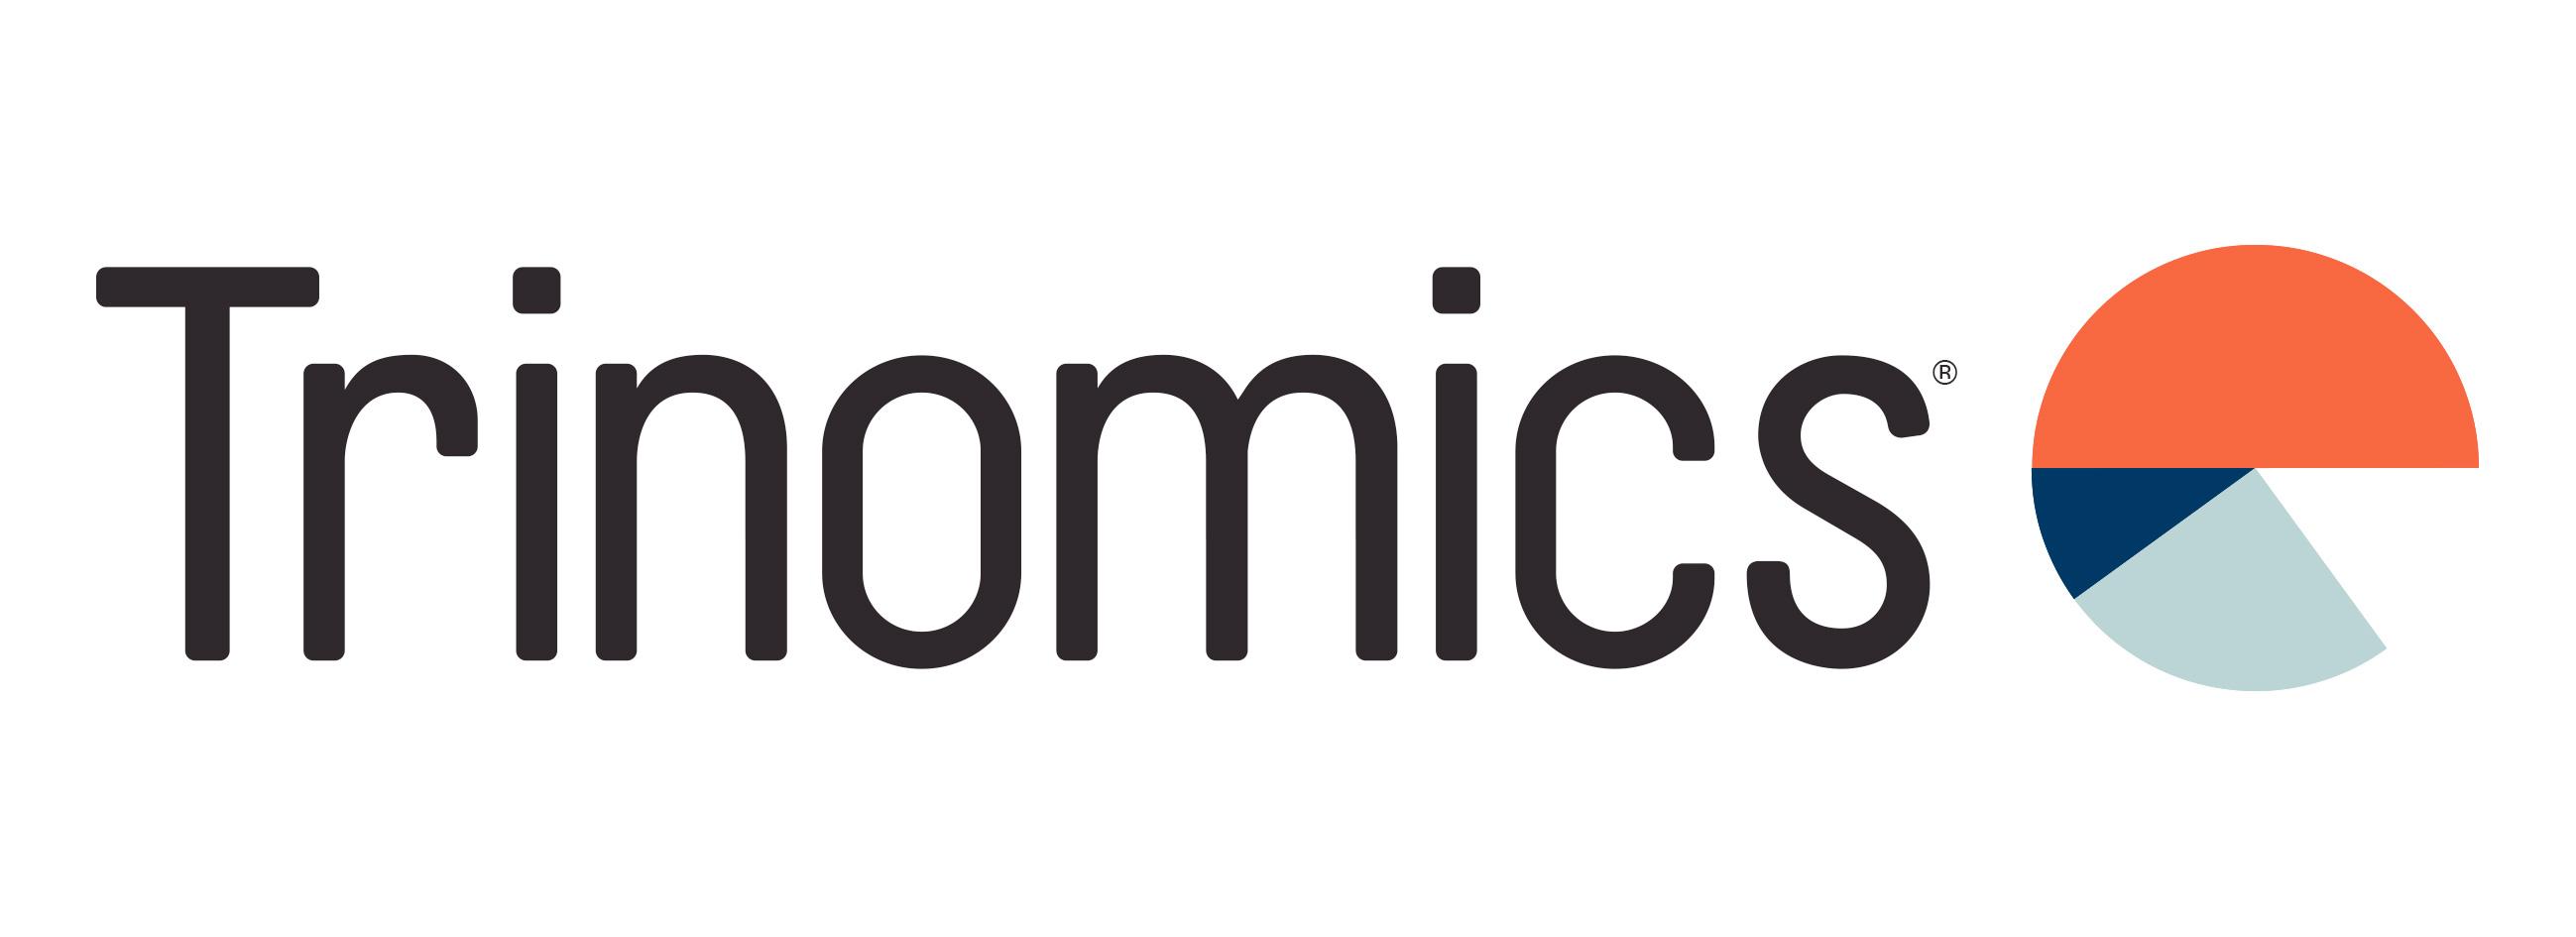 Trinomics-logo – Trinomics